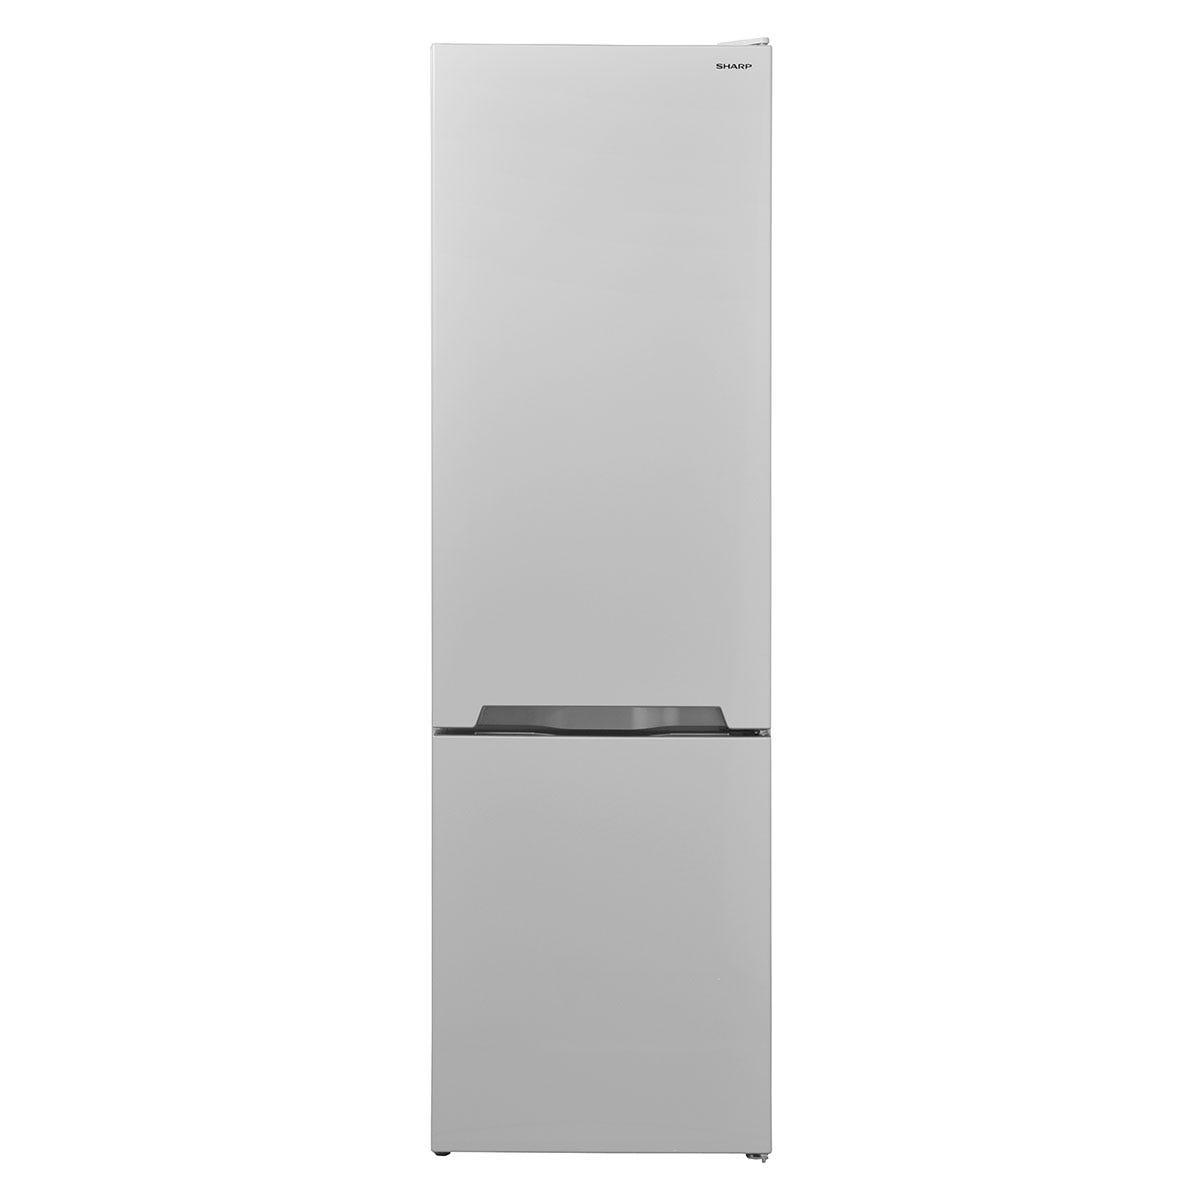 Sharp SJ-BB05DTXW1-EN FS Combi 70/30 Fridge Freezer with NanoFrost Technology - White